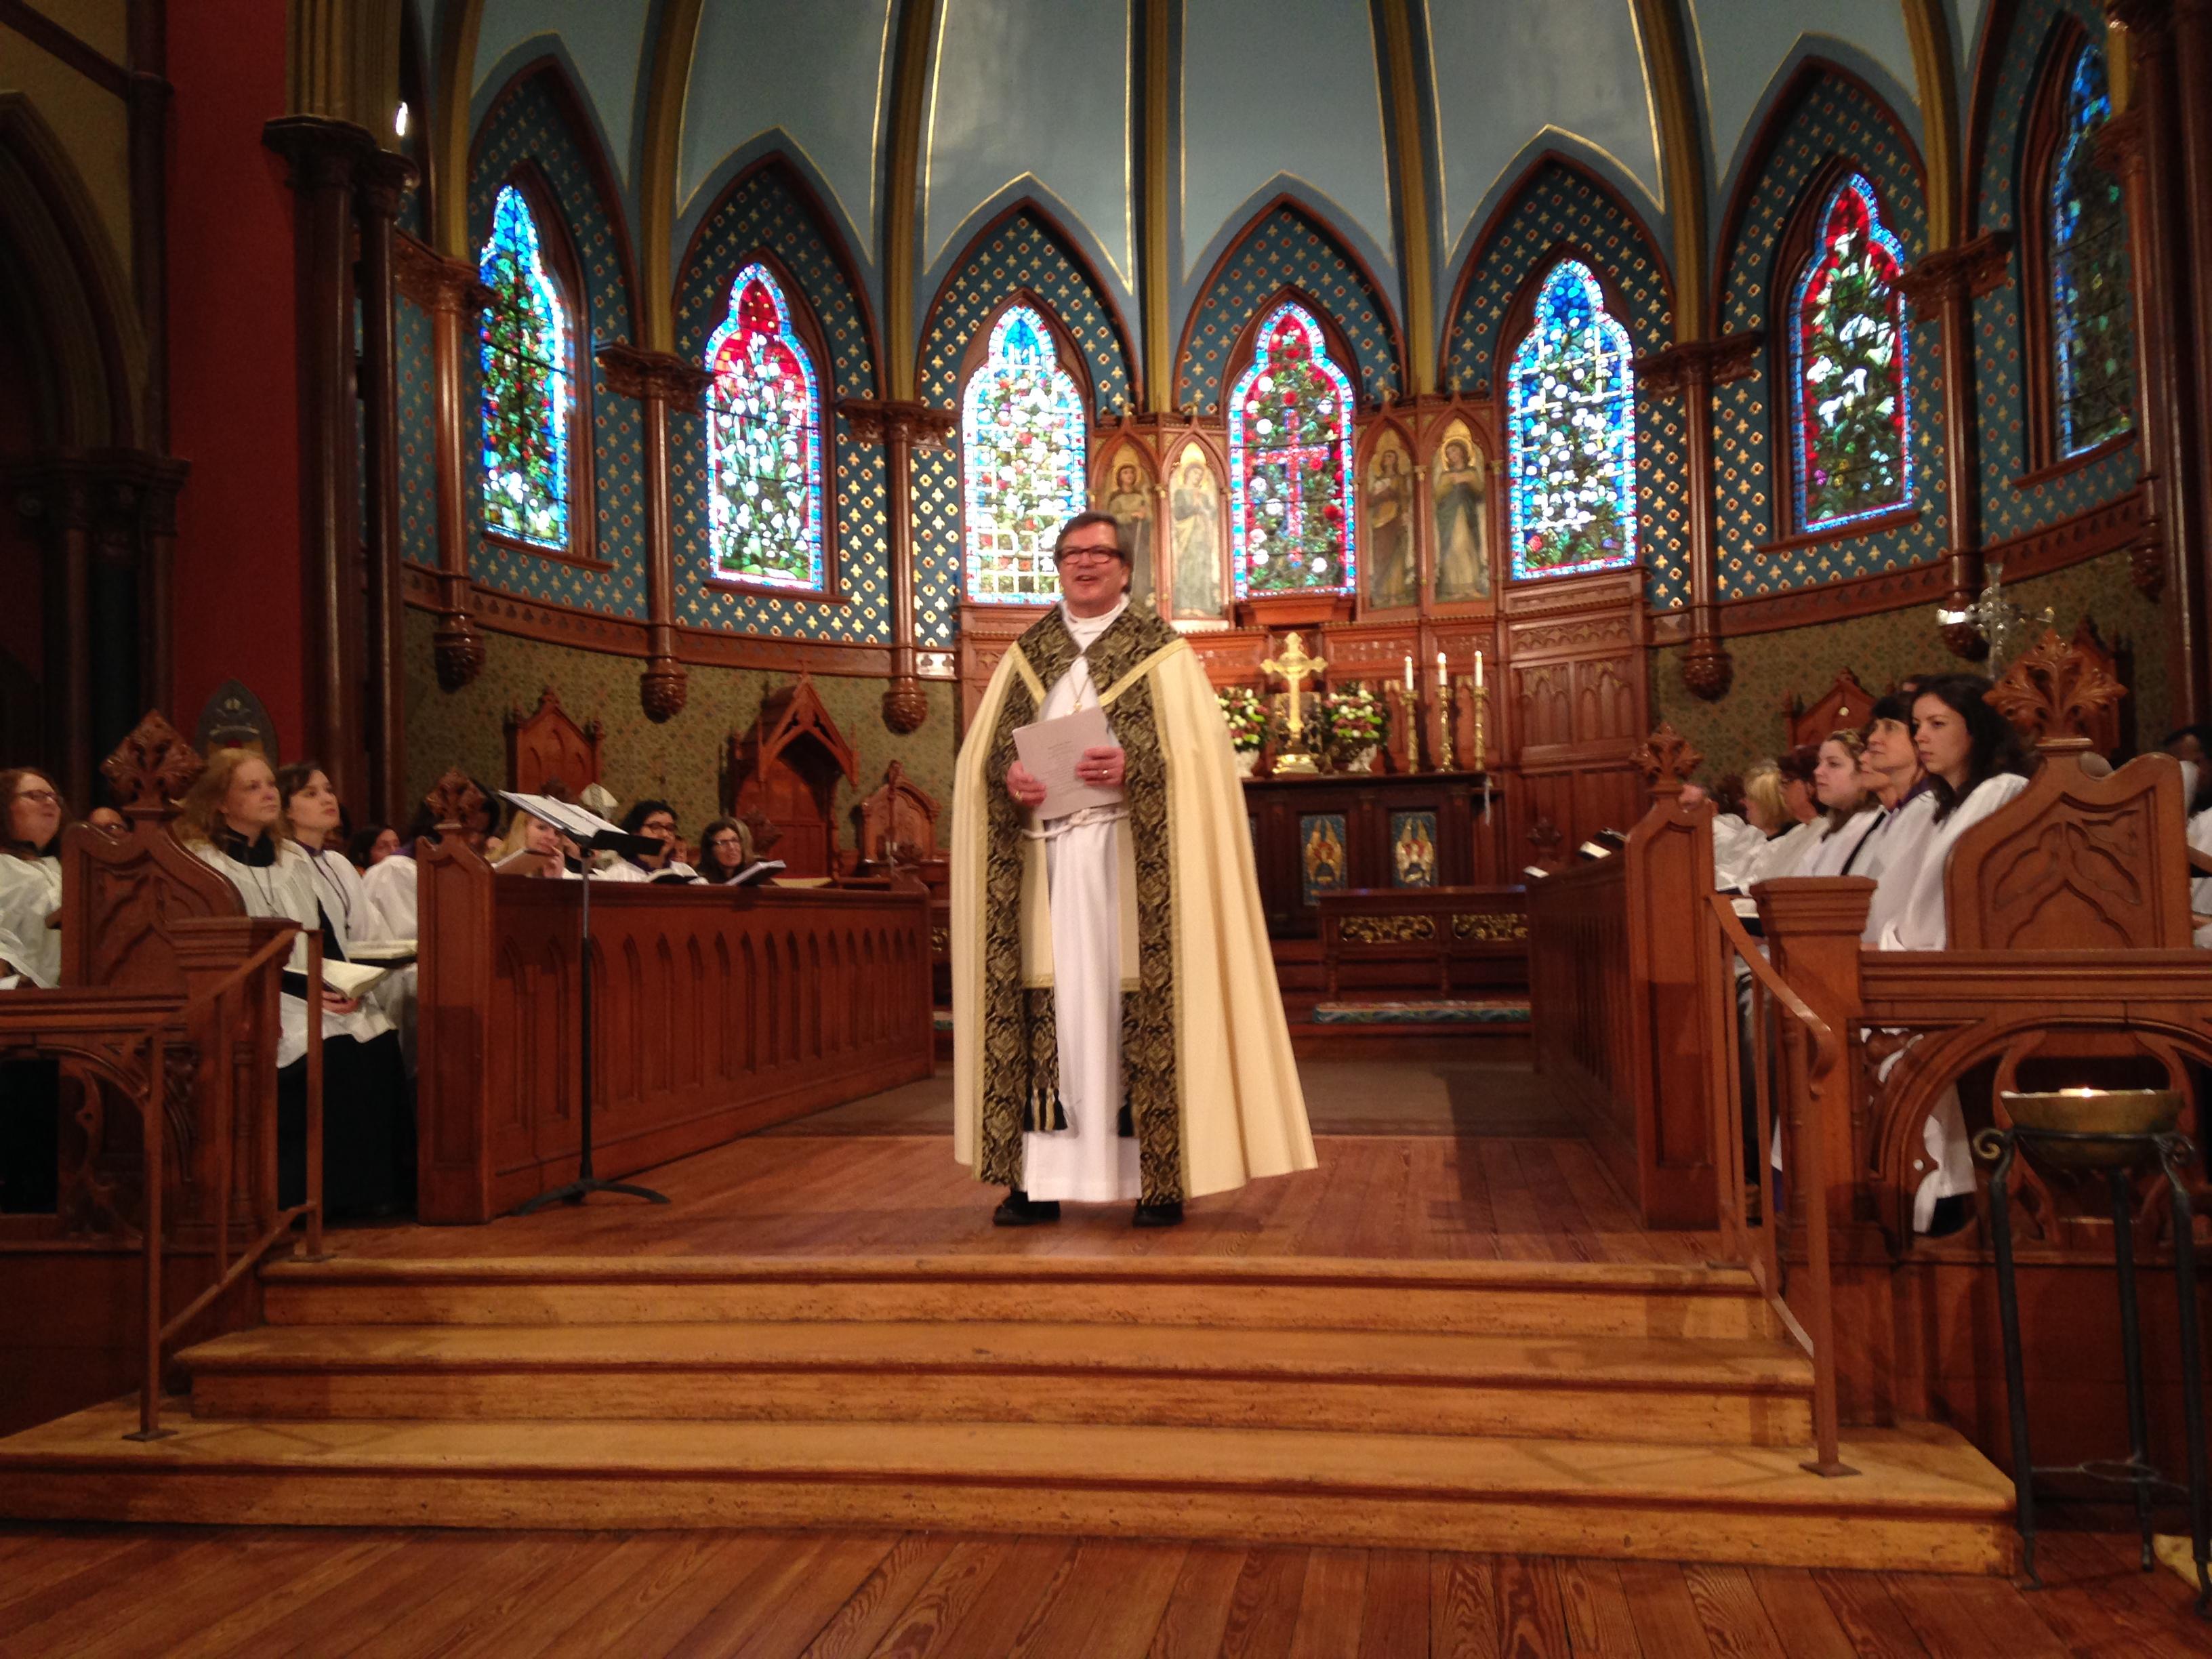 Episcopal Church (United States)